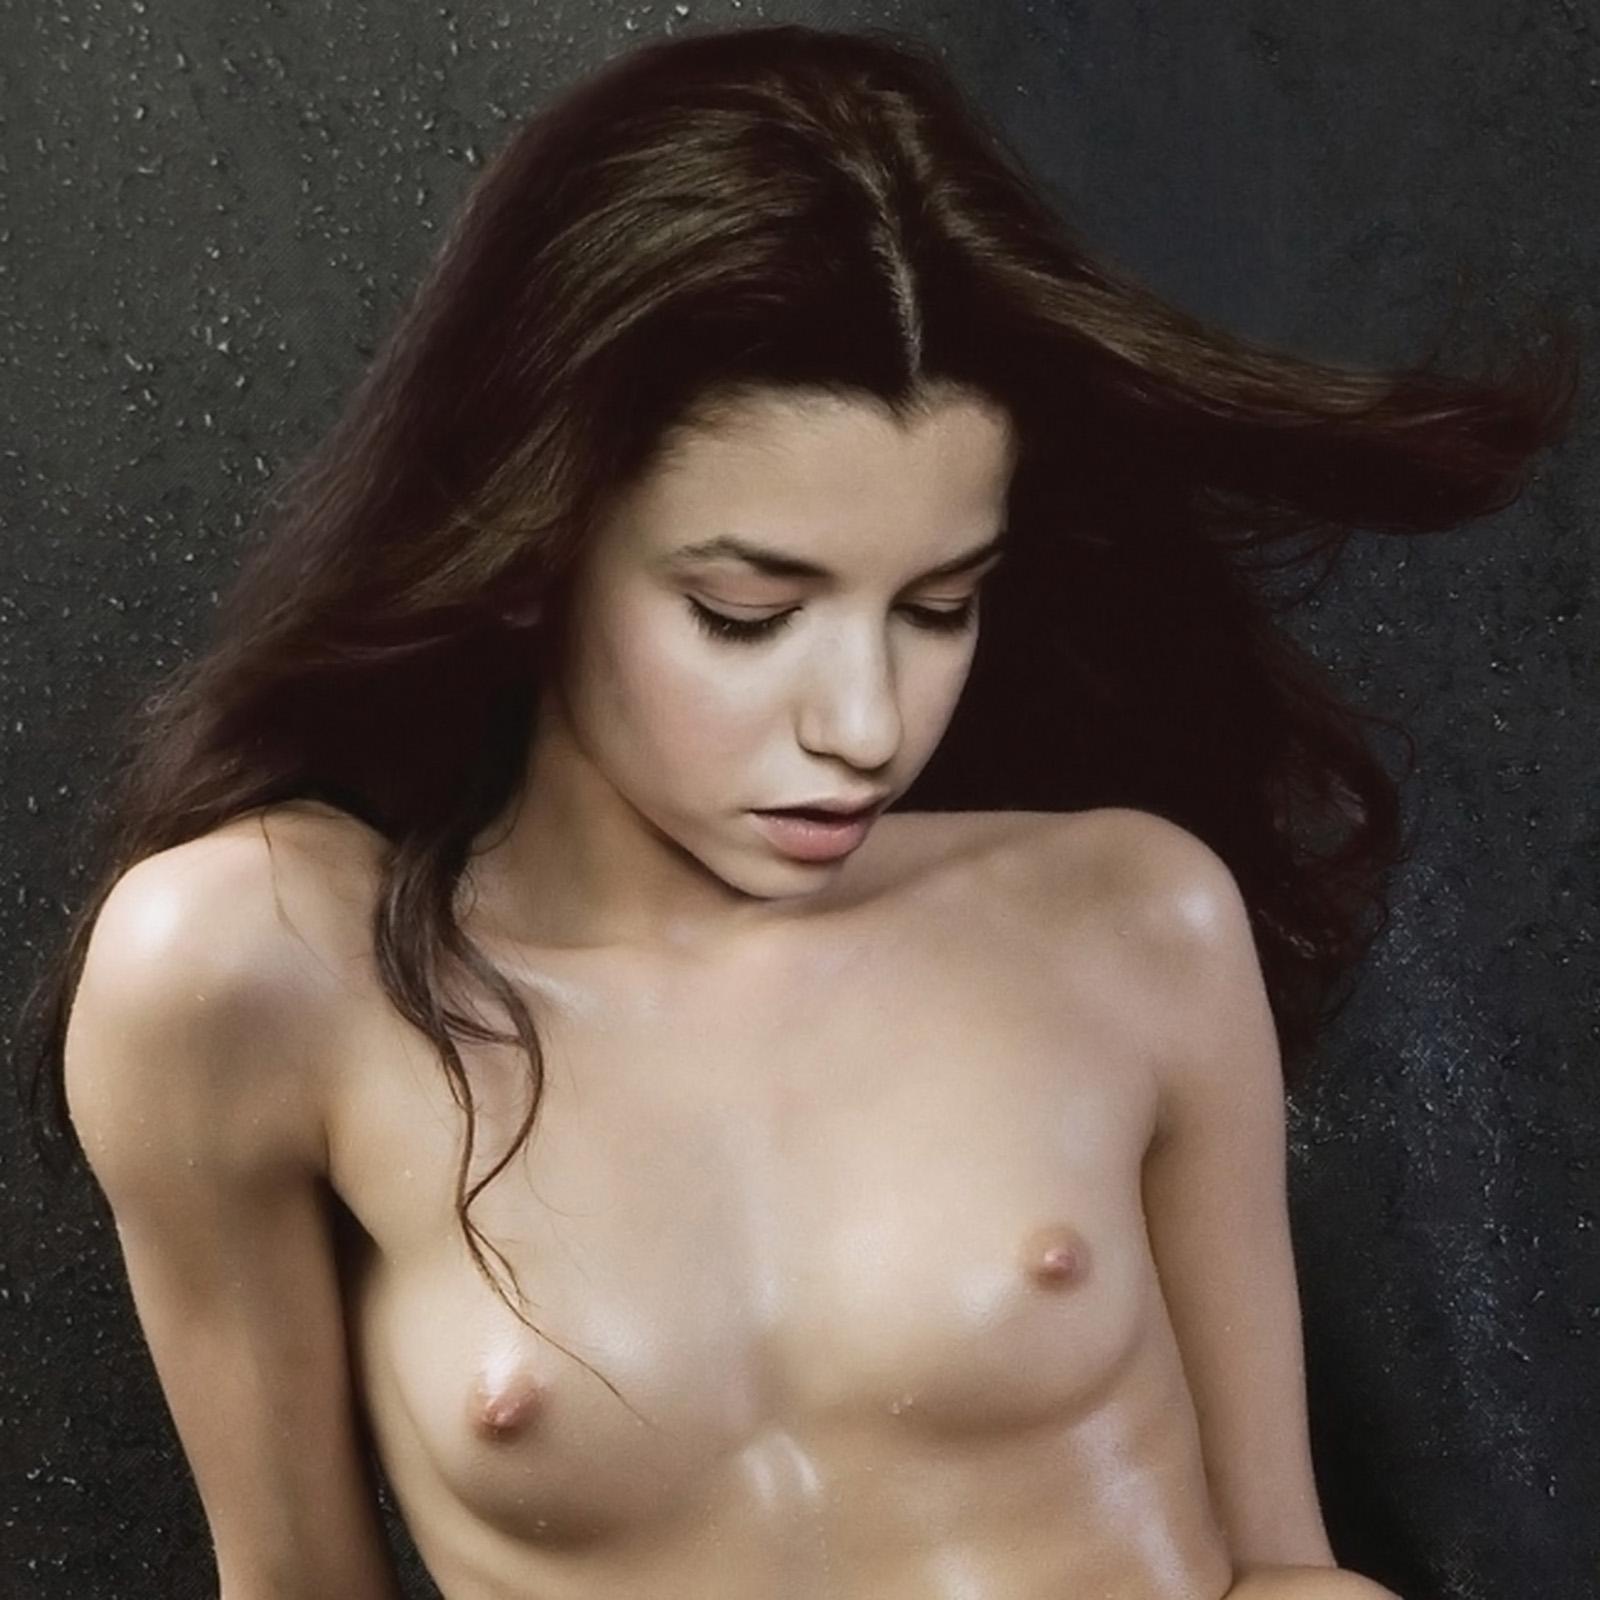 Snooki Nude Phone Photos Leaked